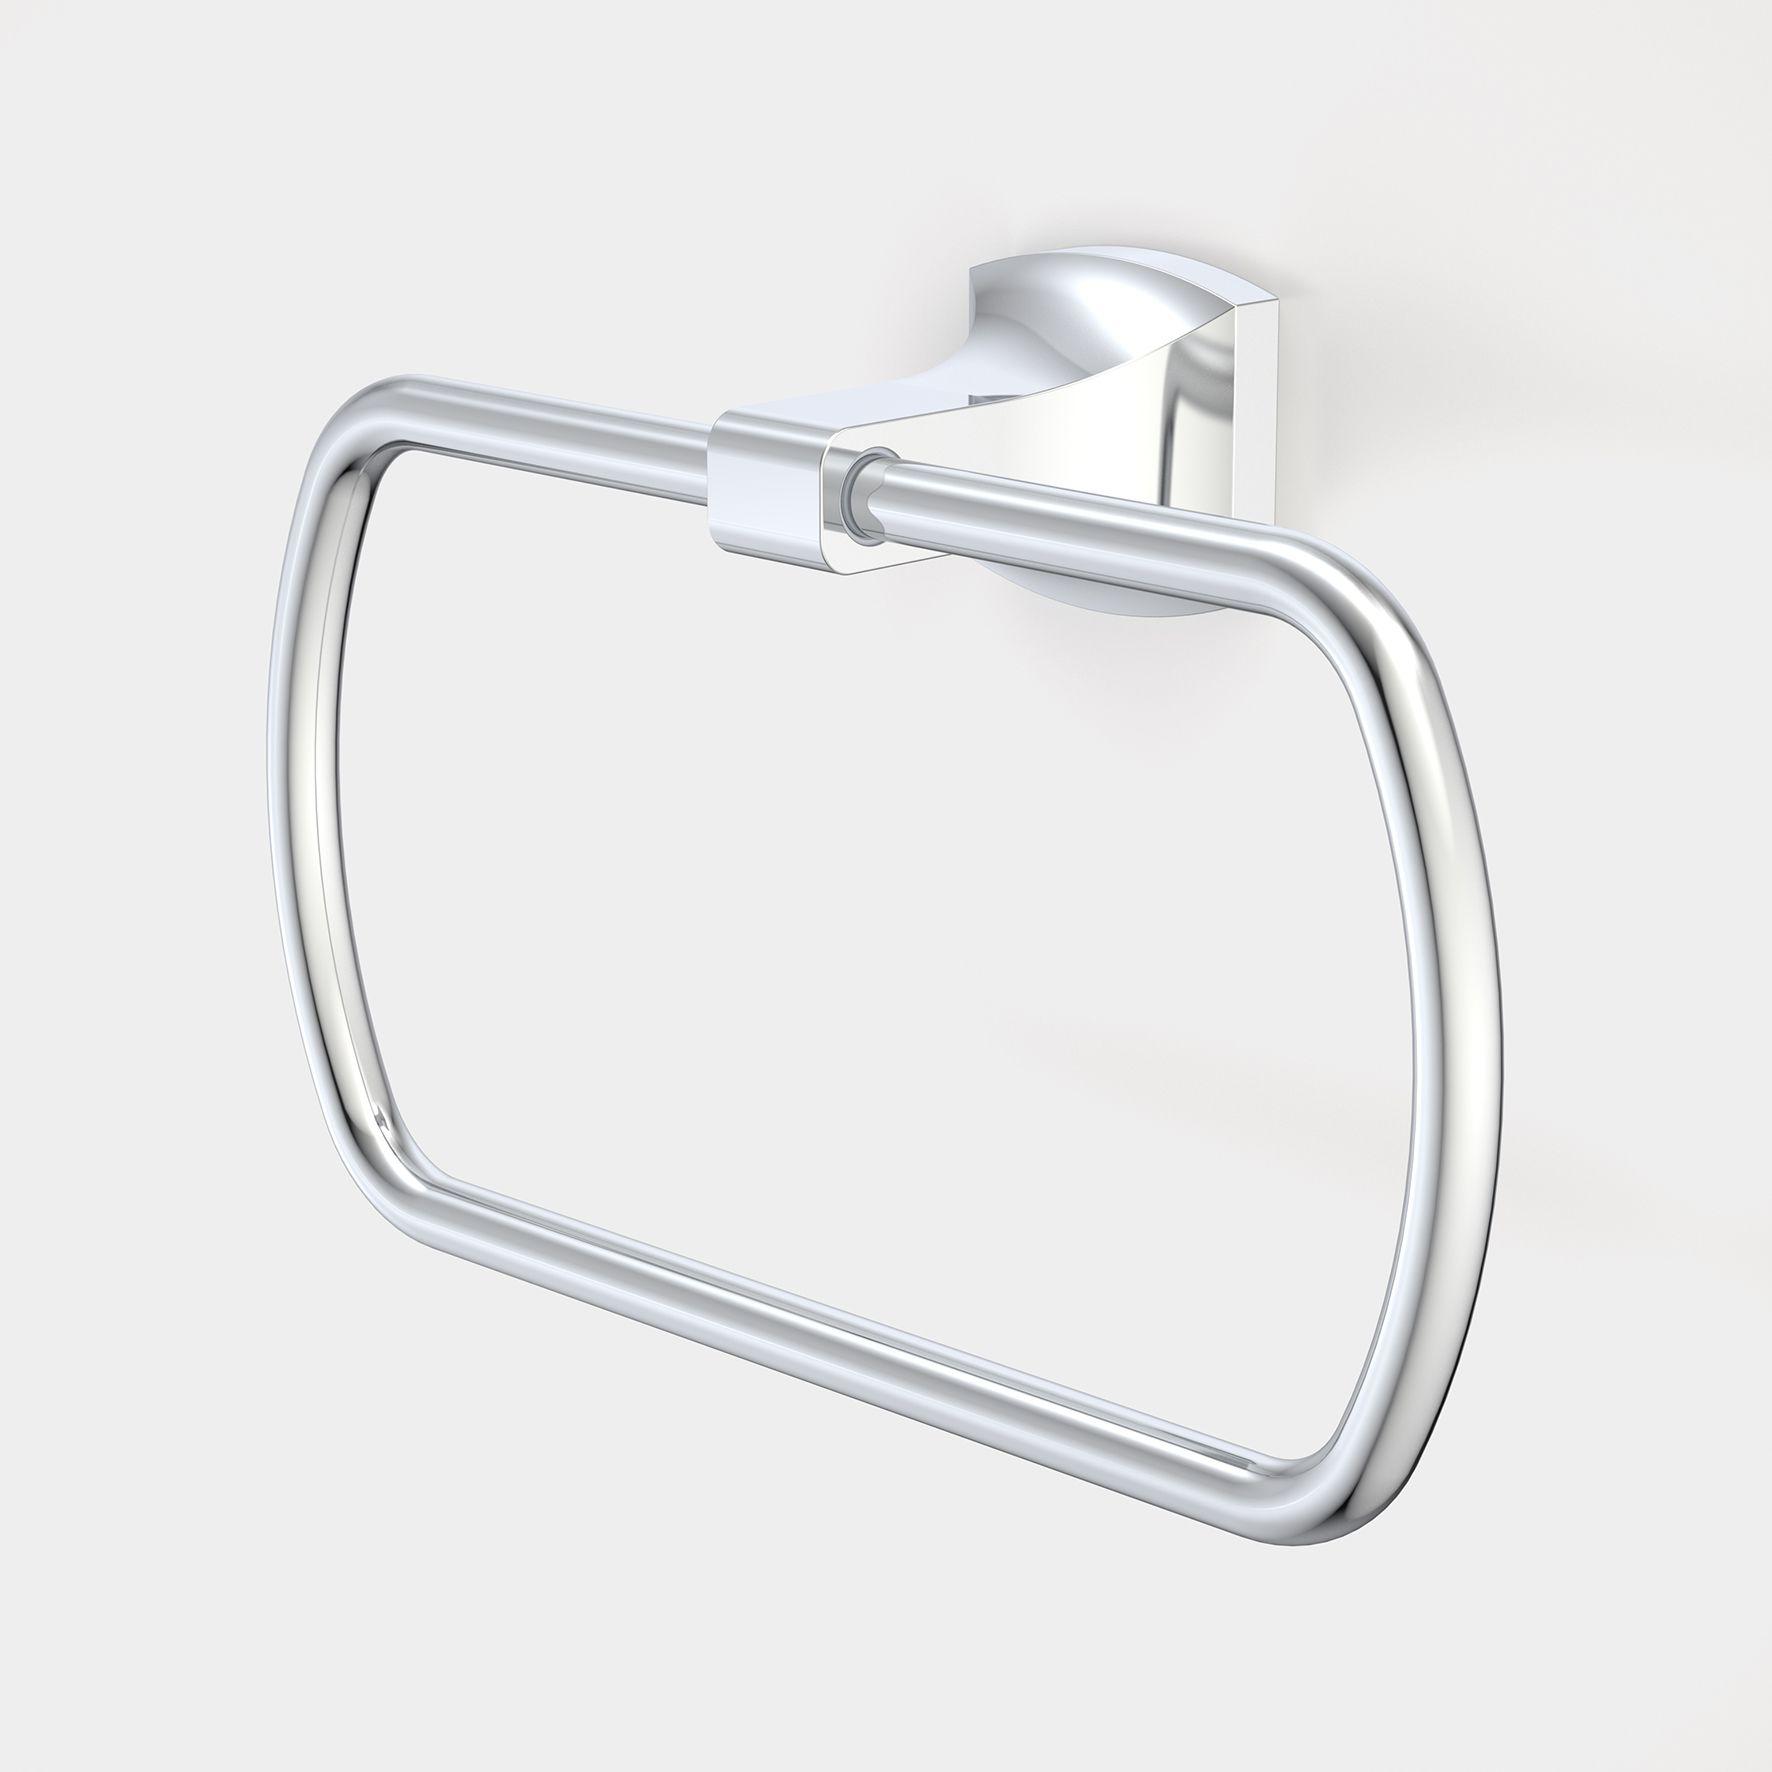 Caroma Pillar Towel Ring http://www.caroma.com.au/bathrooms/bathroom ...